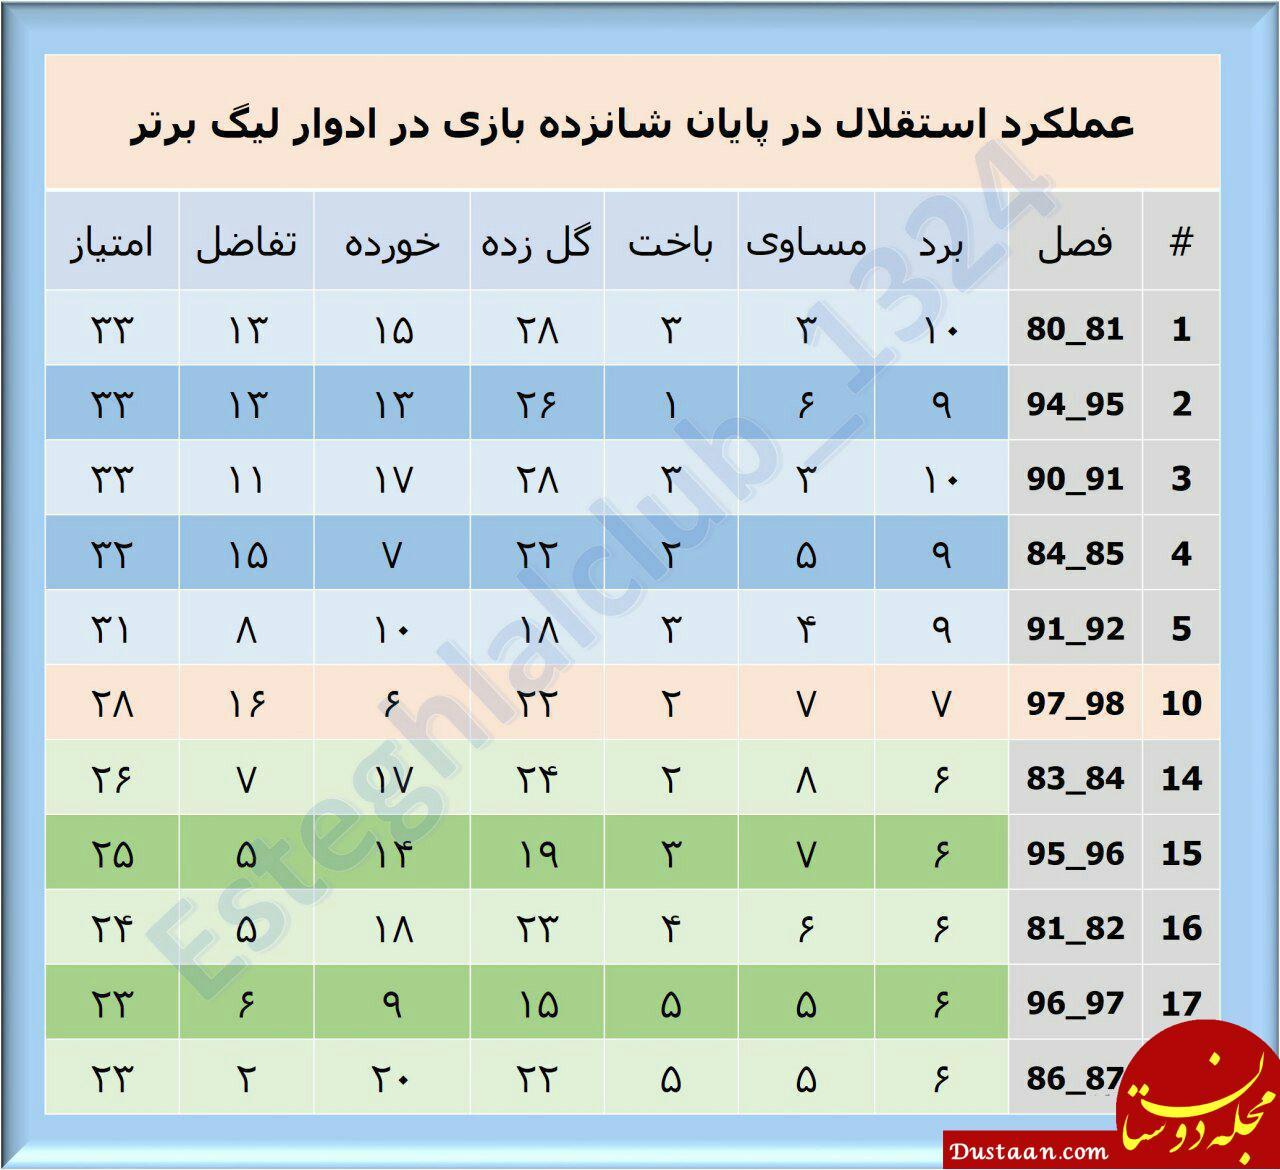 www.dustaan.com عملکرد استقلال تا هفته شانزدهم در دوره های لیگ برتر